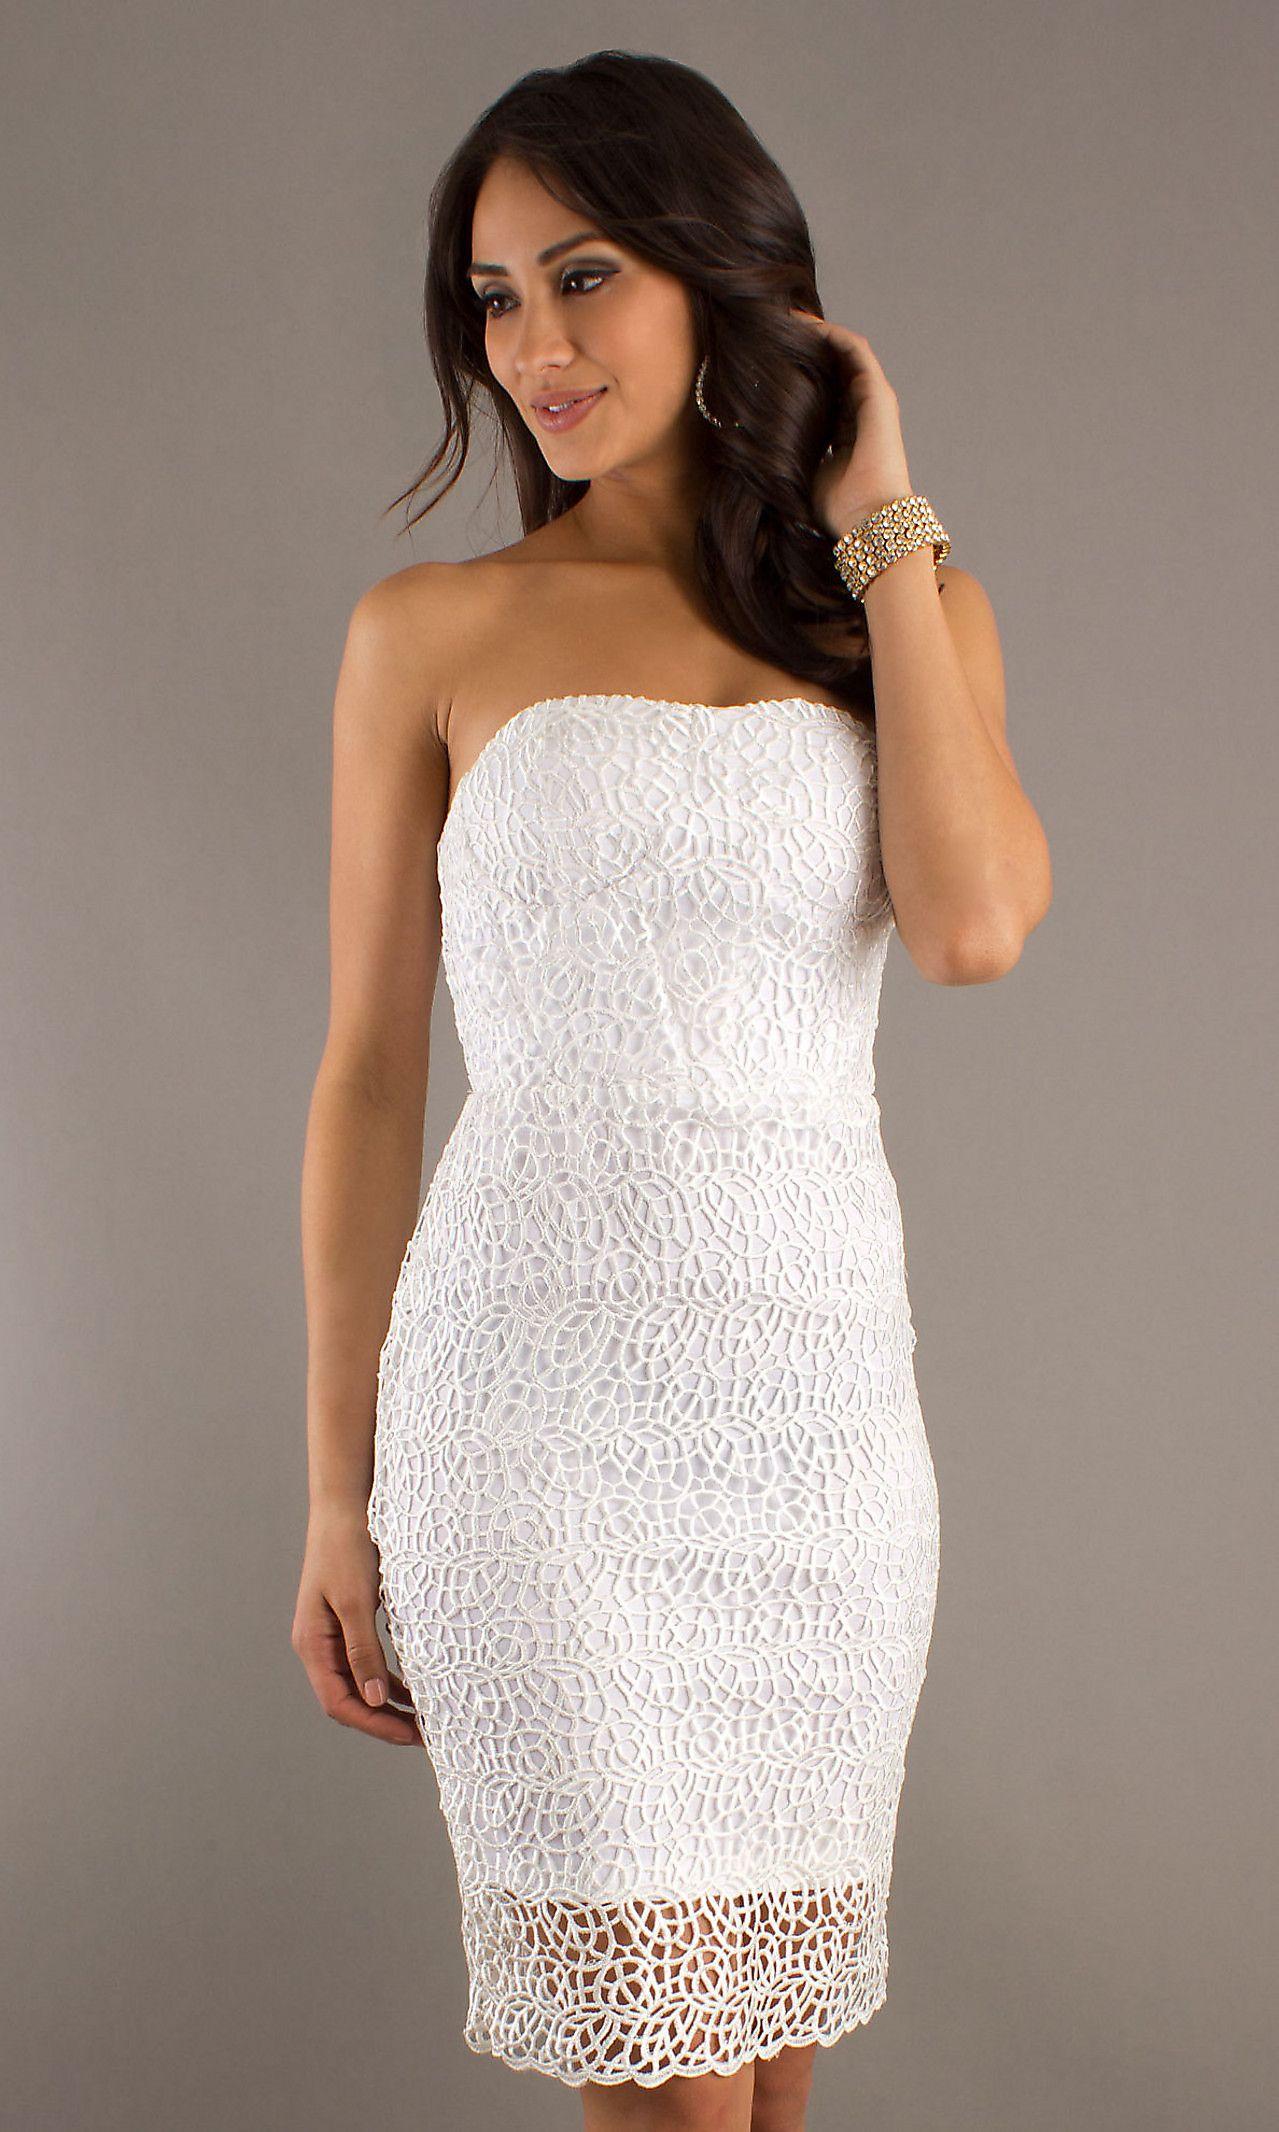 Knee Length Strapless Dress DI-K0190A